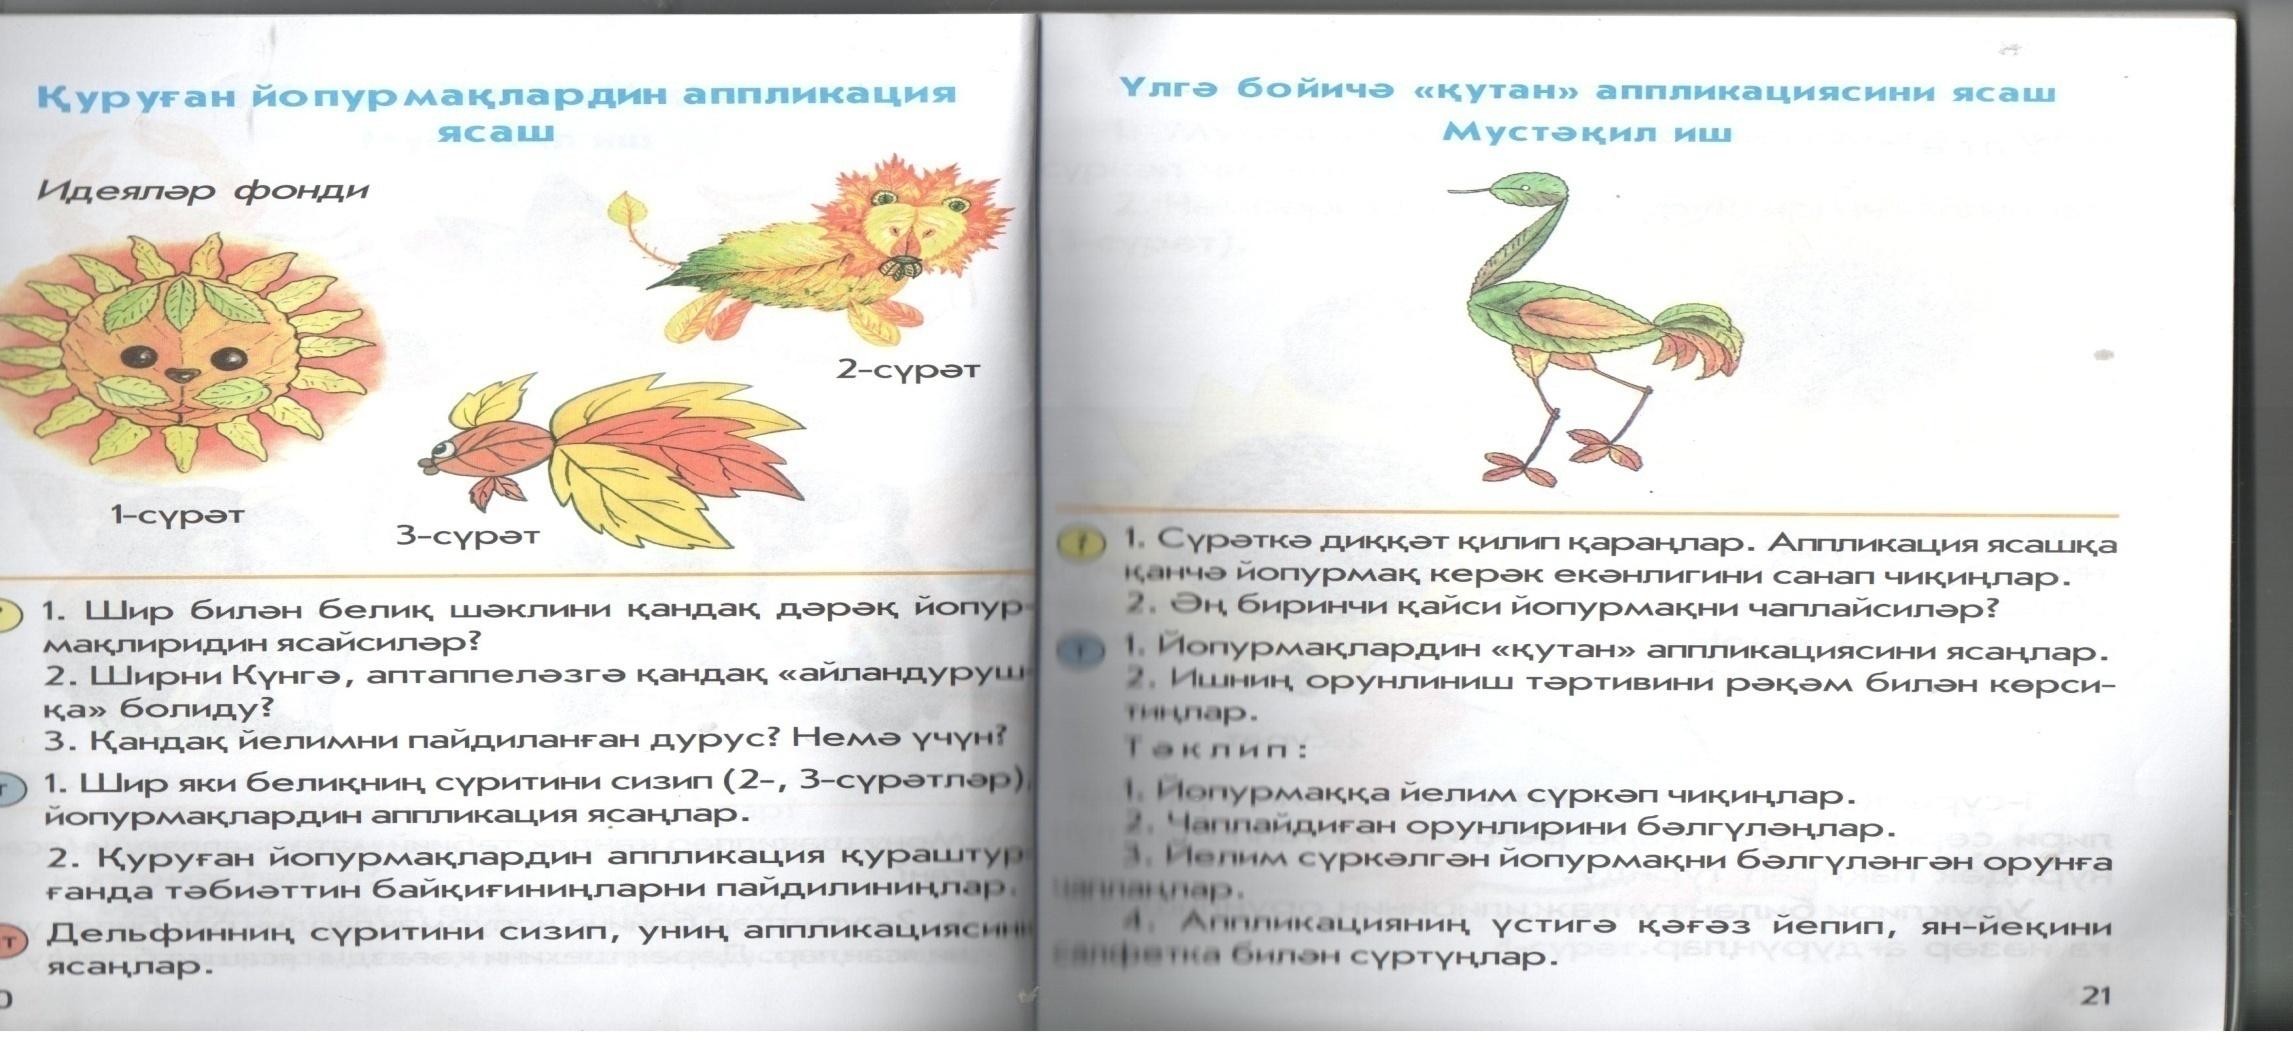 C:\Users\777\Documents\Scanned Documents\Рисунок (52).jpg